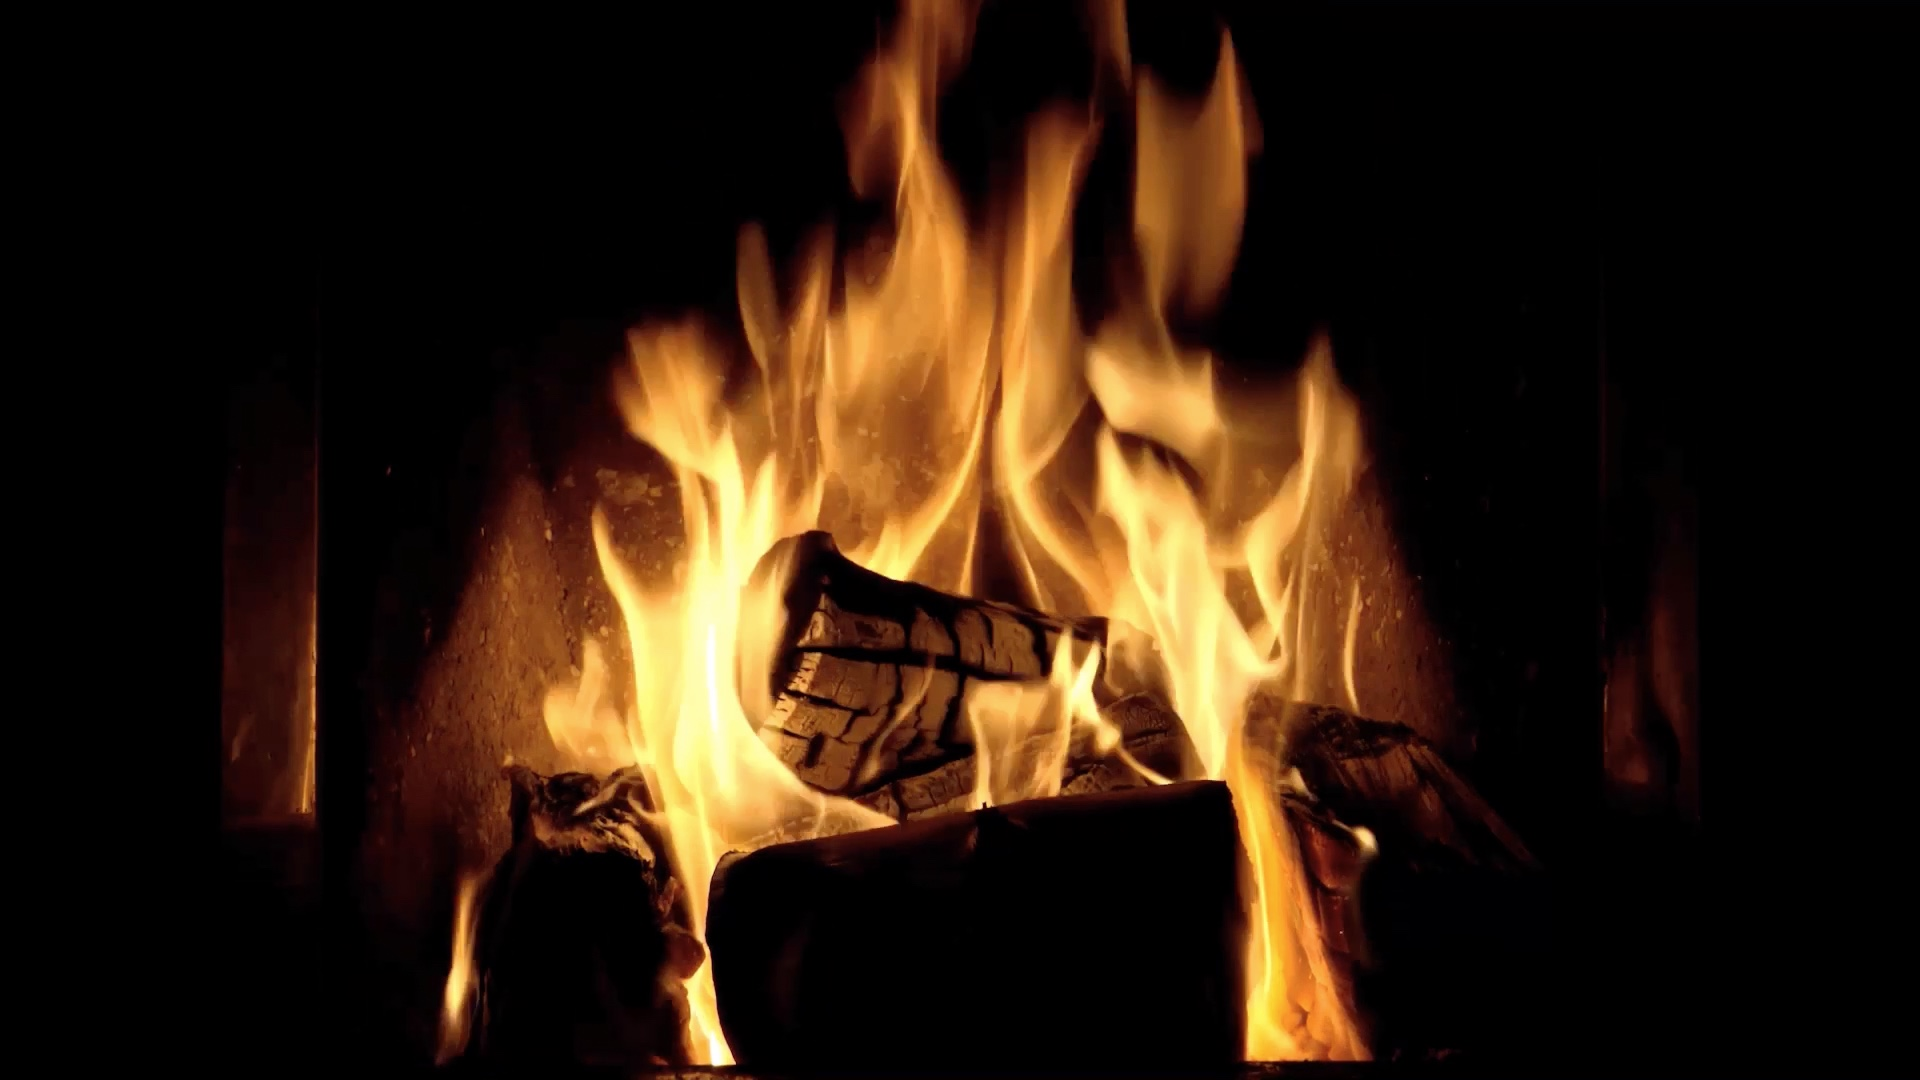 Fantastic Fireplace Apple TV